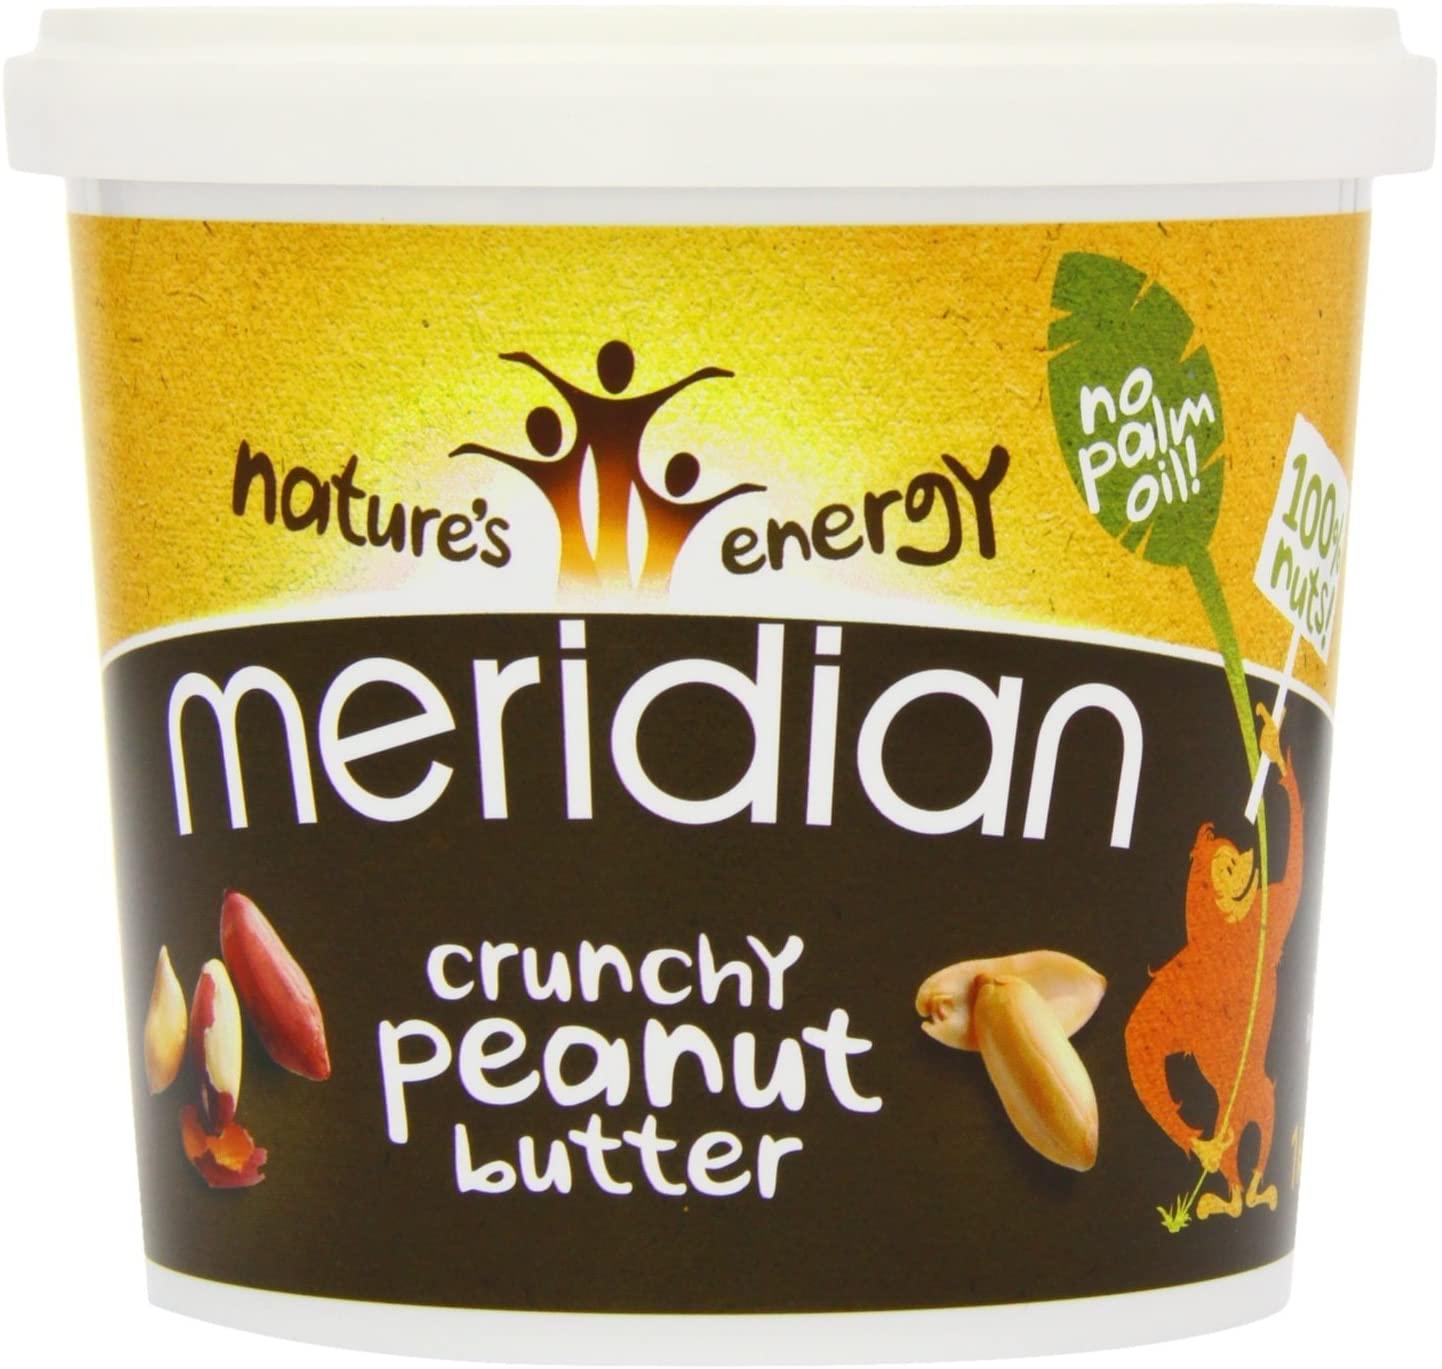 Meridian Natural Crunchy Peanut Butter 1kg